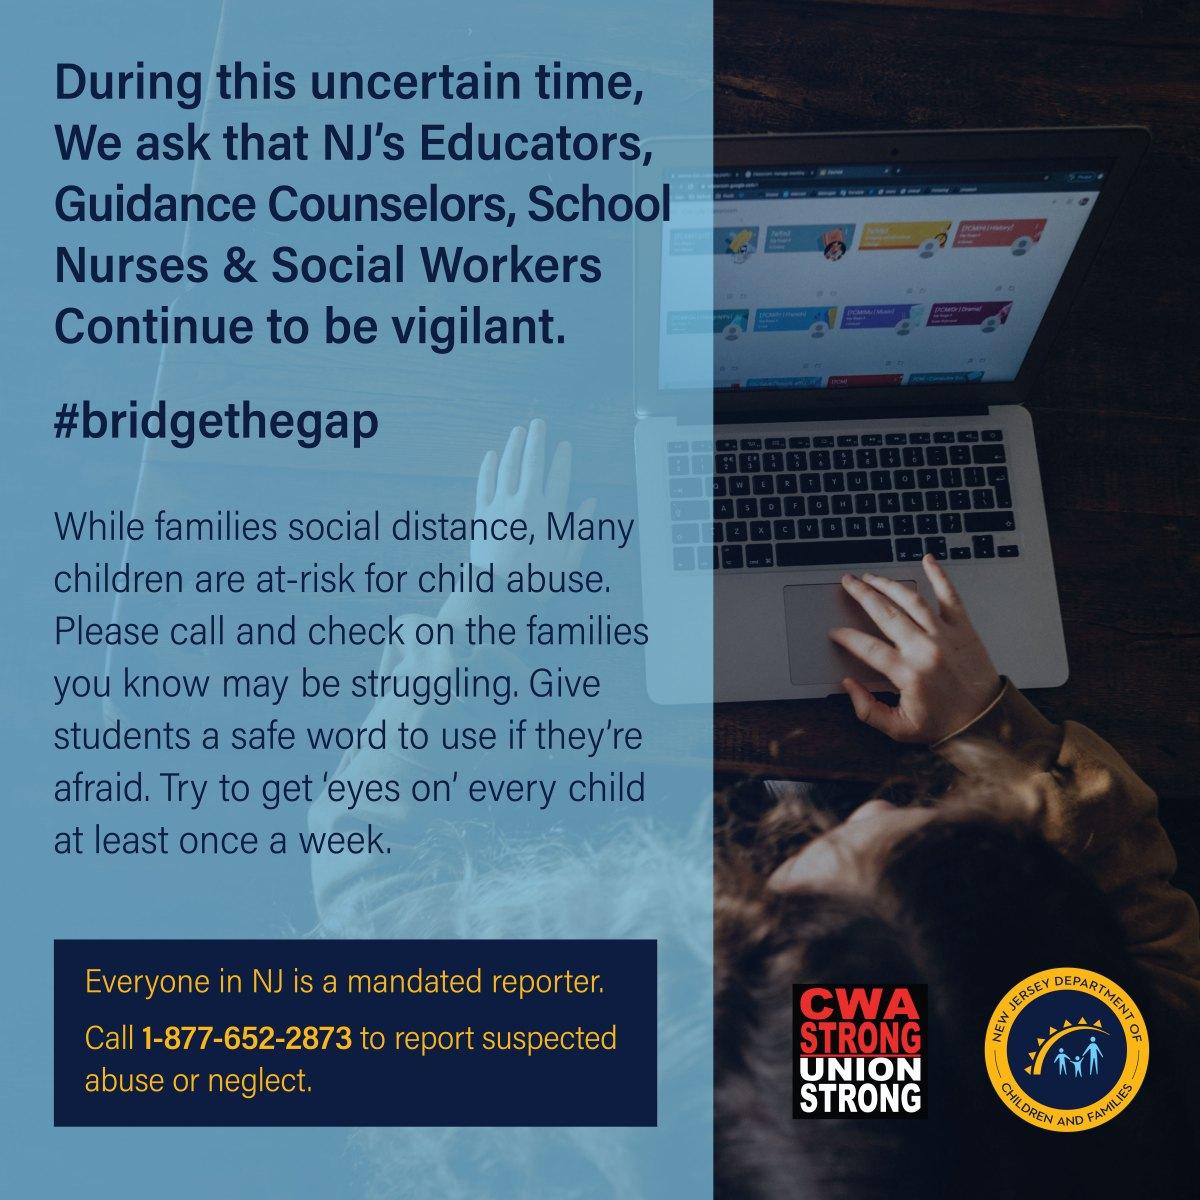 Child.Abuse.Prevention.bridgethegap CWA DCF 2